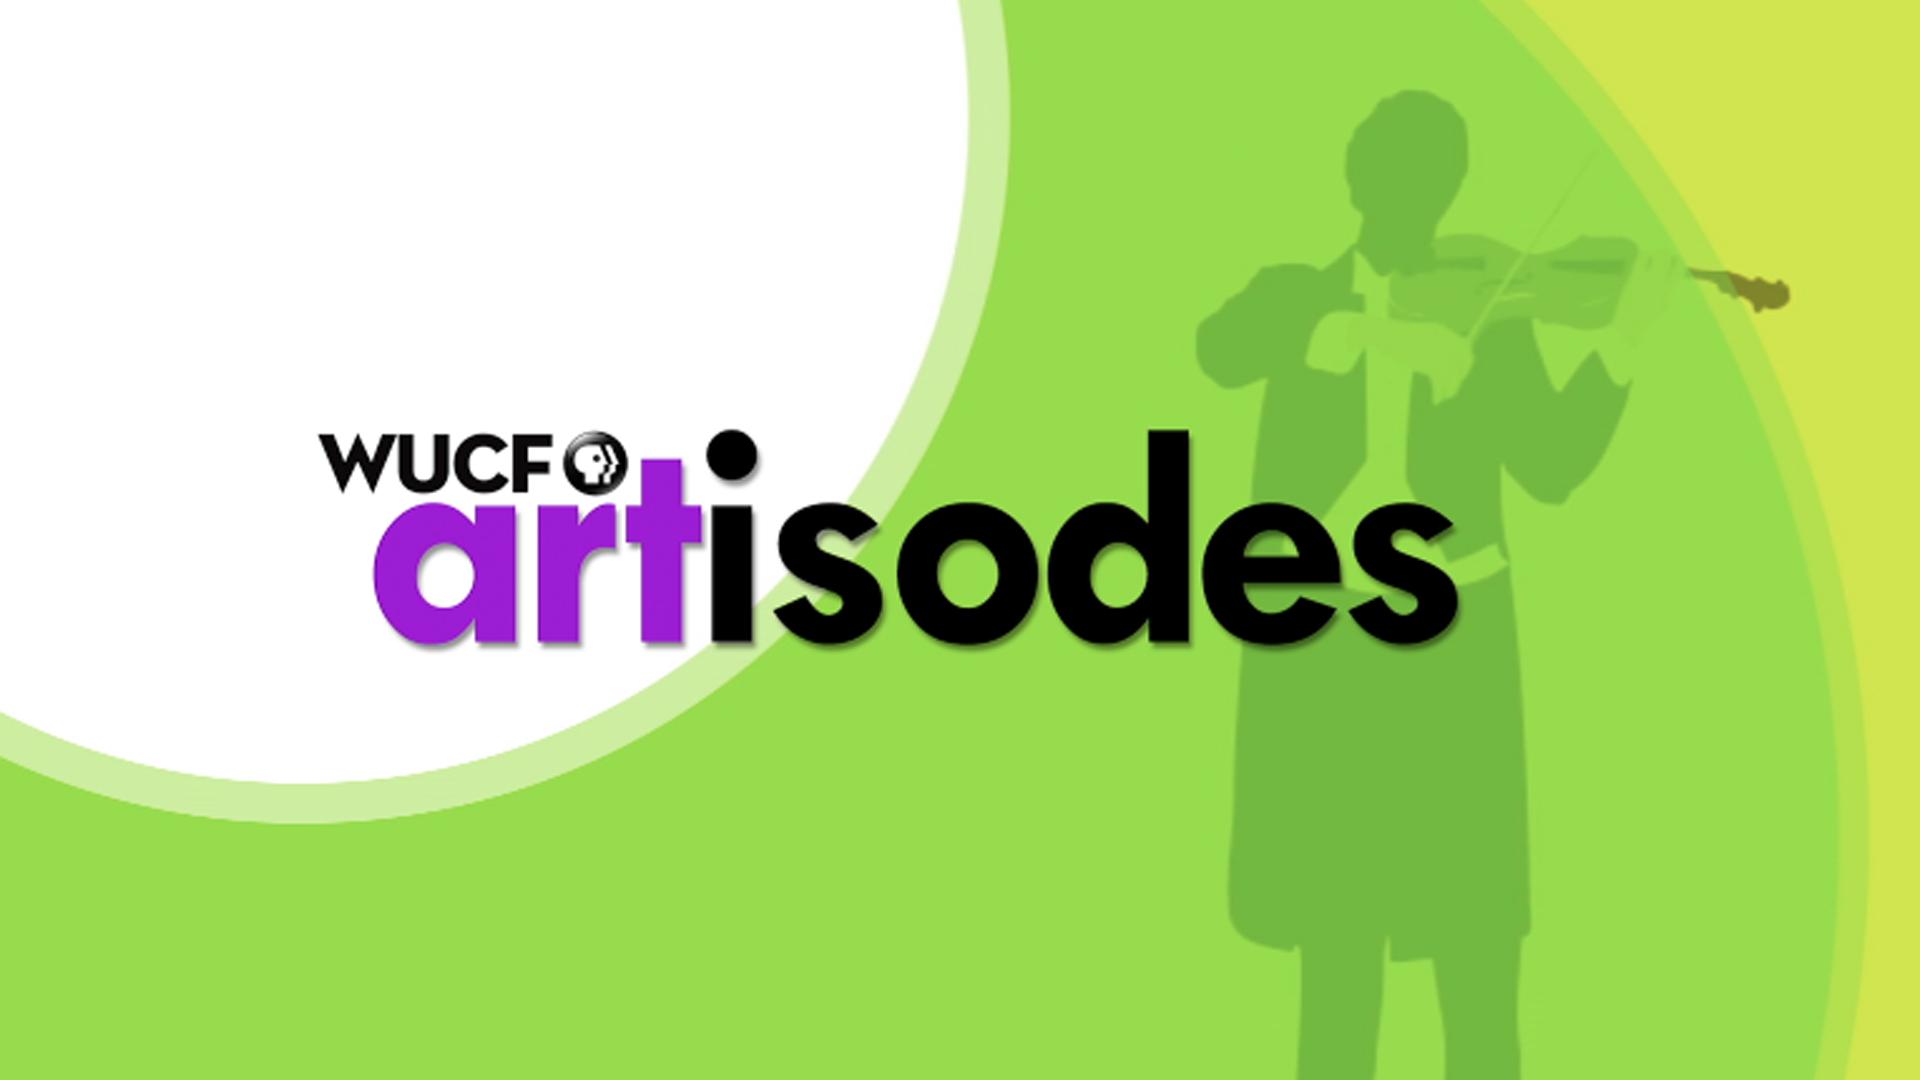 WUCF Artisodes